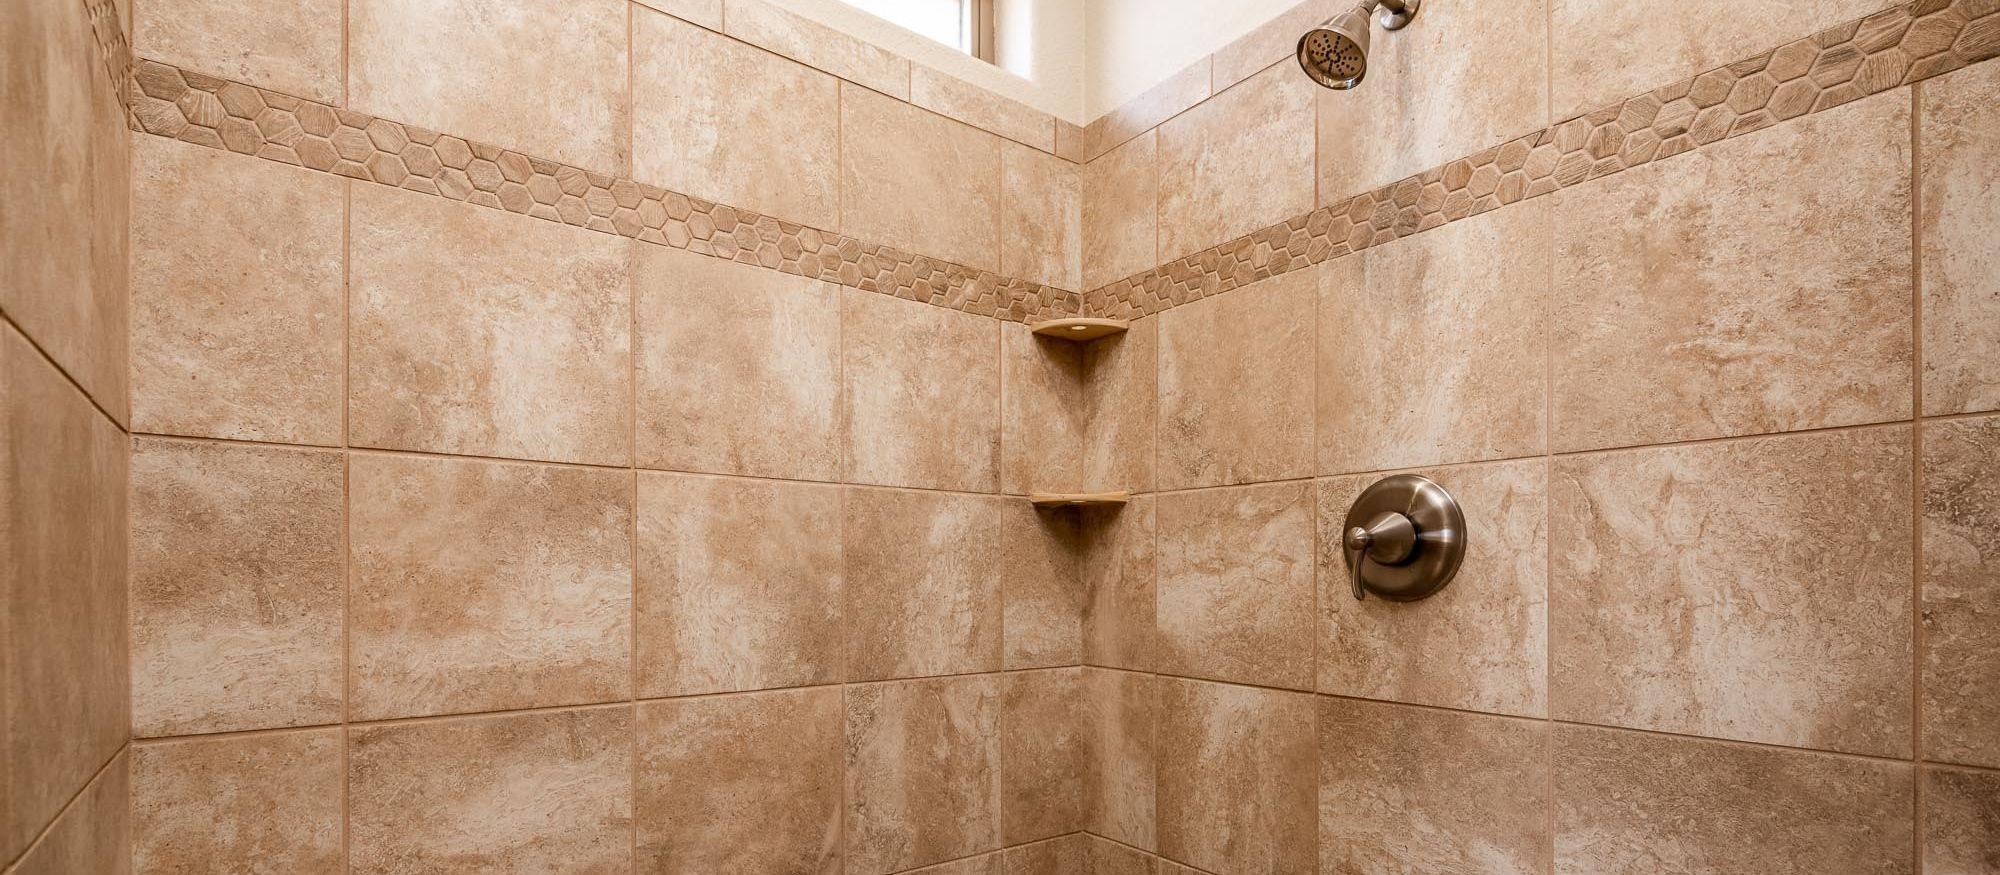 Bathroom featured in the Joshua 1909 By Angle Homes in Kingman-Lake Havasu City, AZ